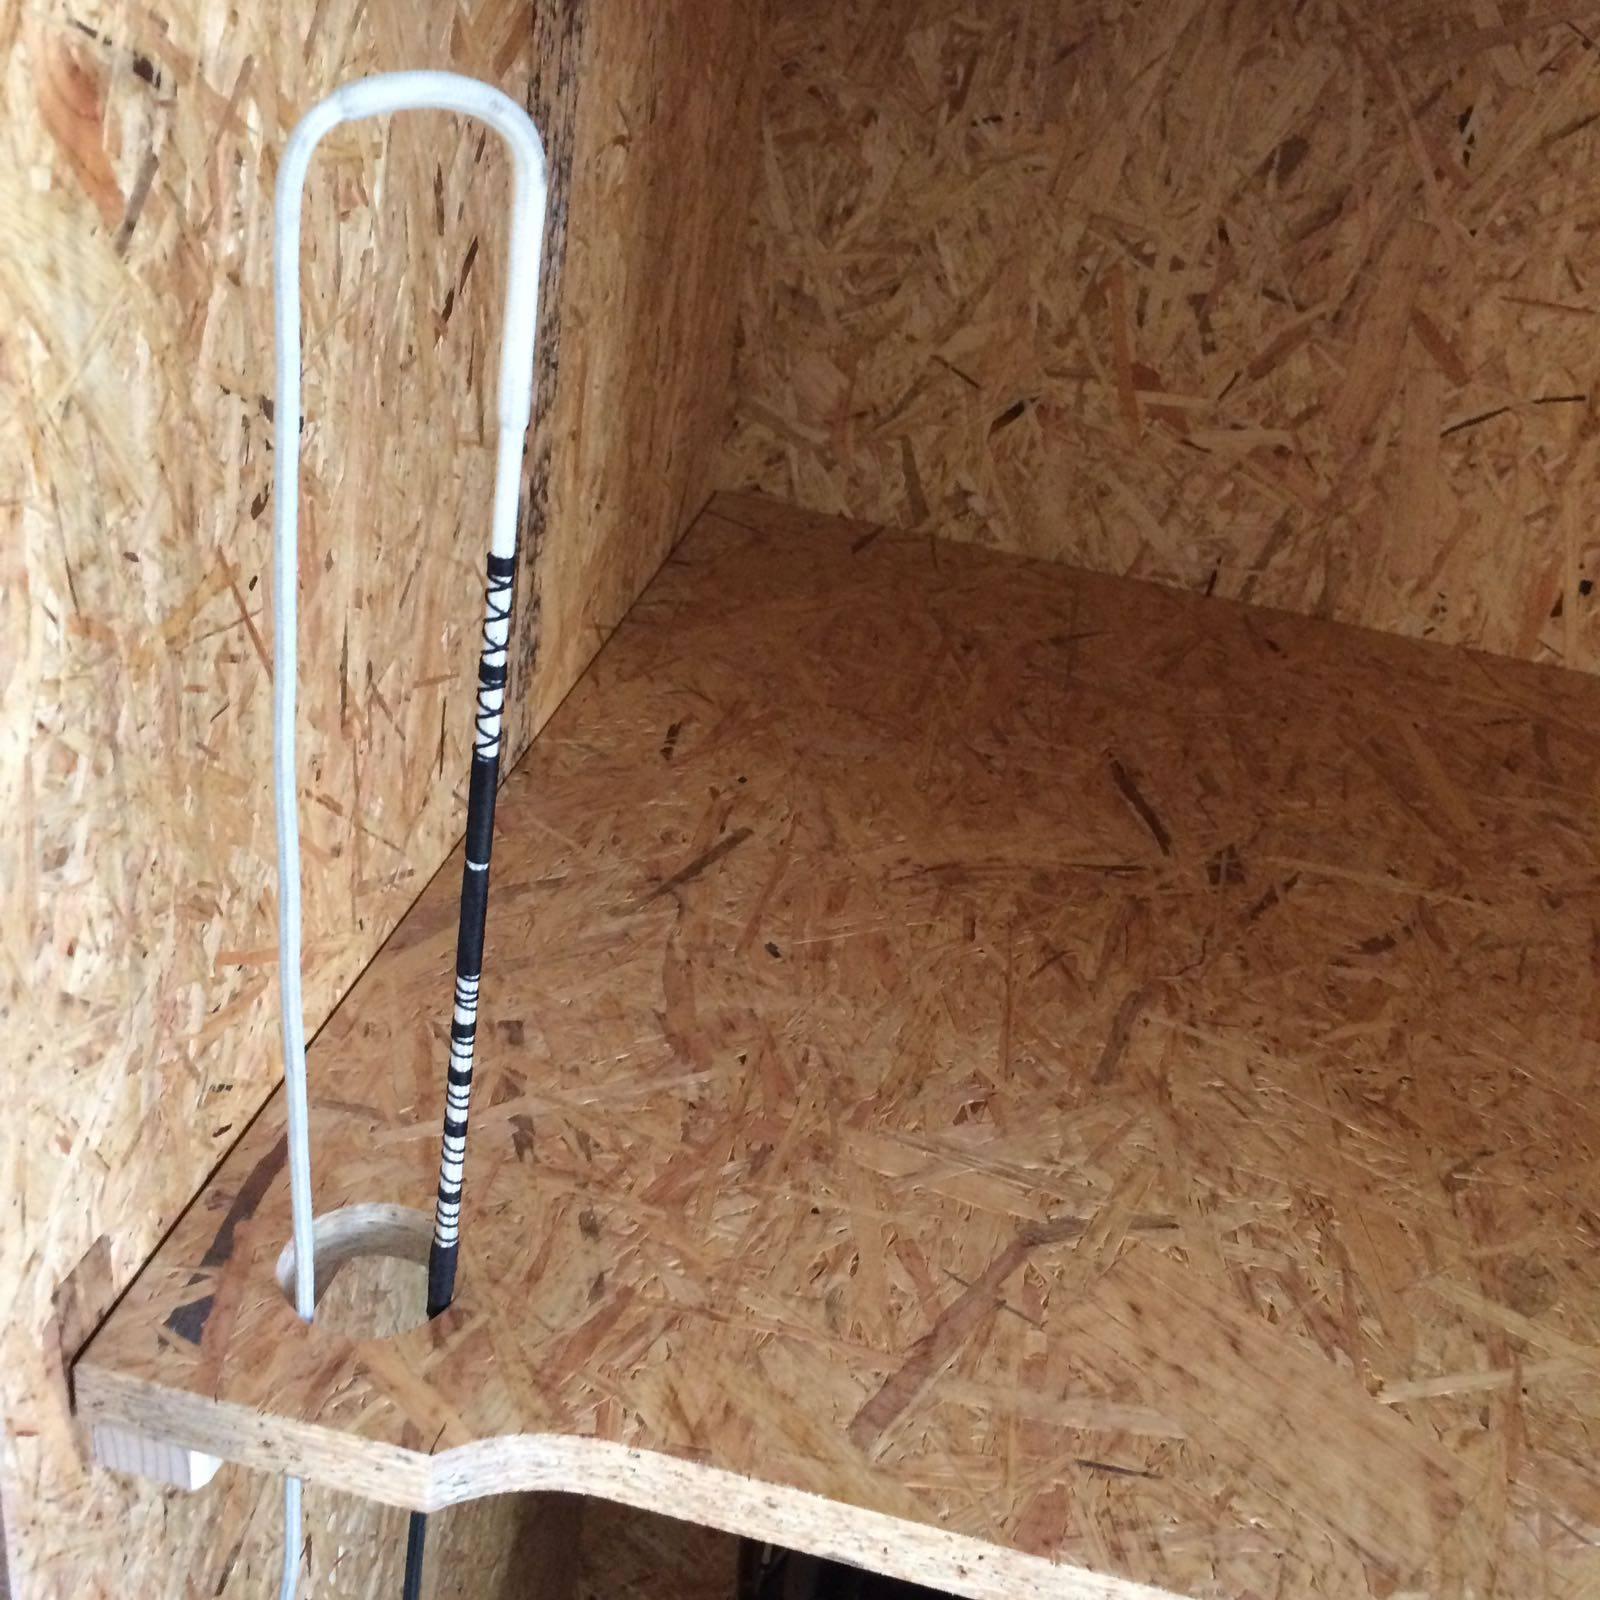 sattelschrank in 19 mm osb platten 1 teilig zeller pferdesport. Black Bedroom Furniture Sets. Home Design Ideas